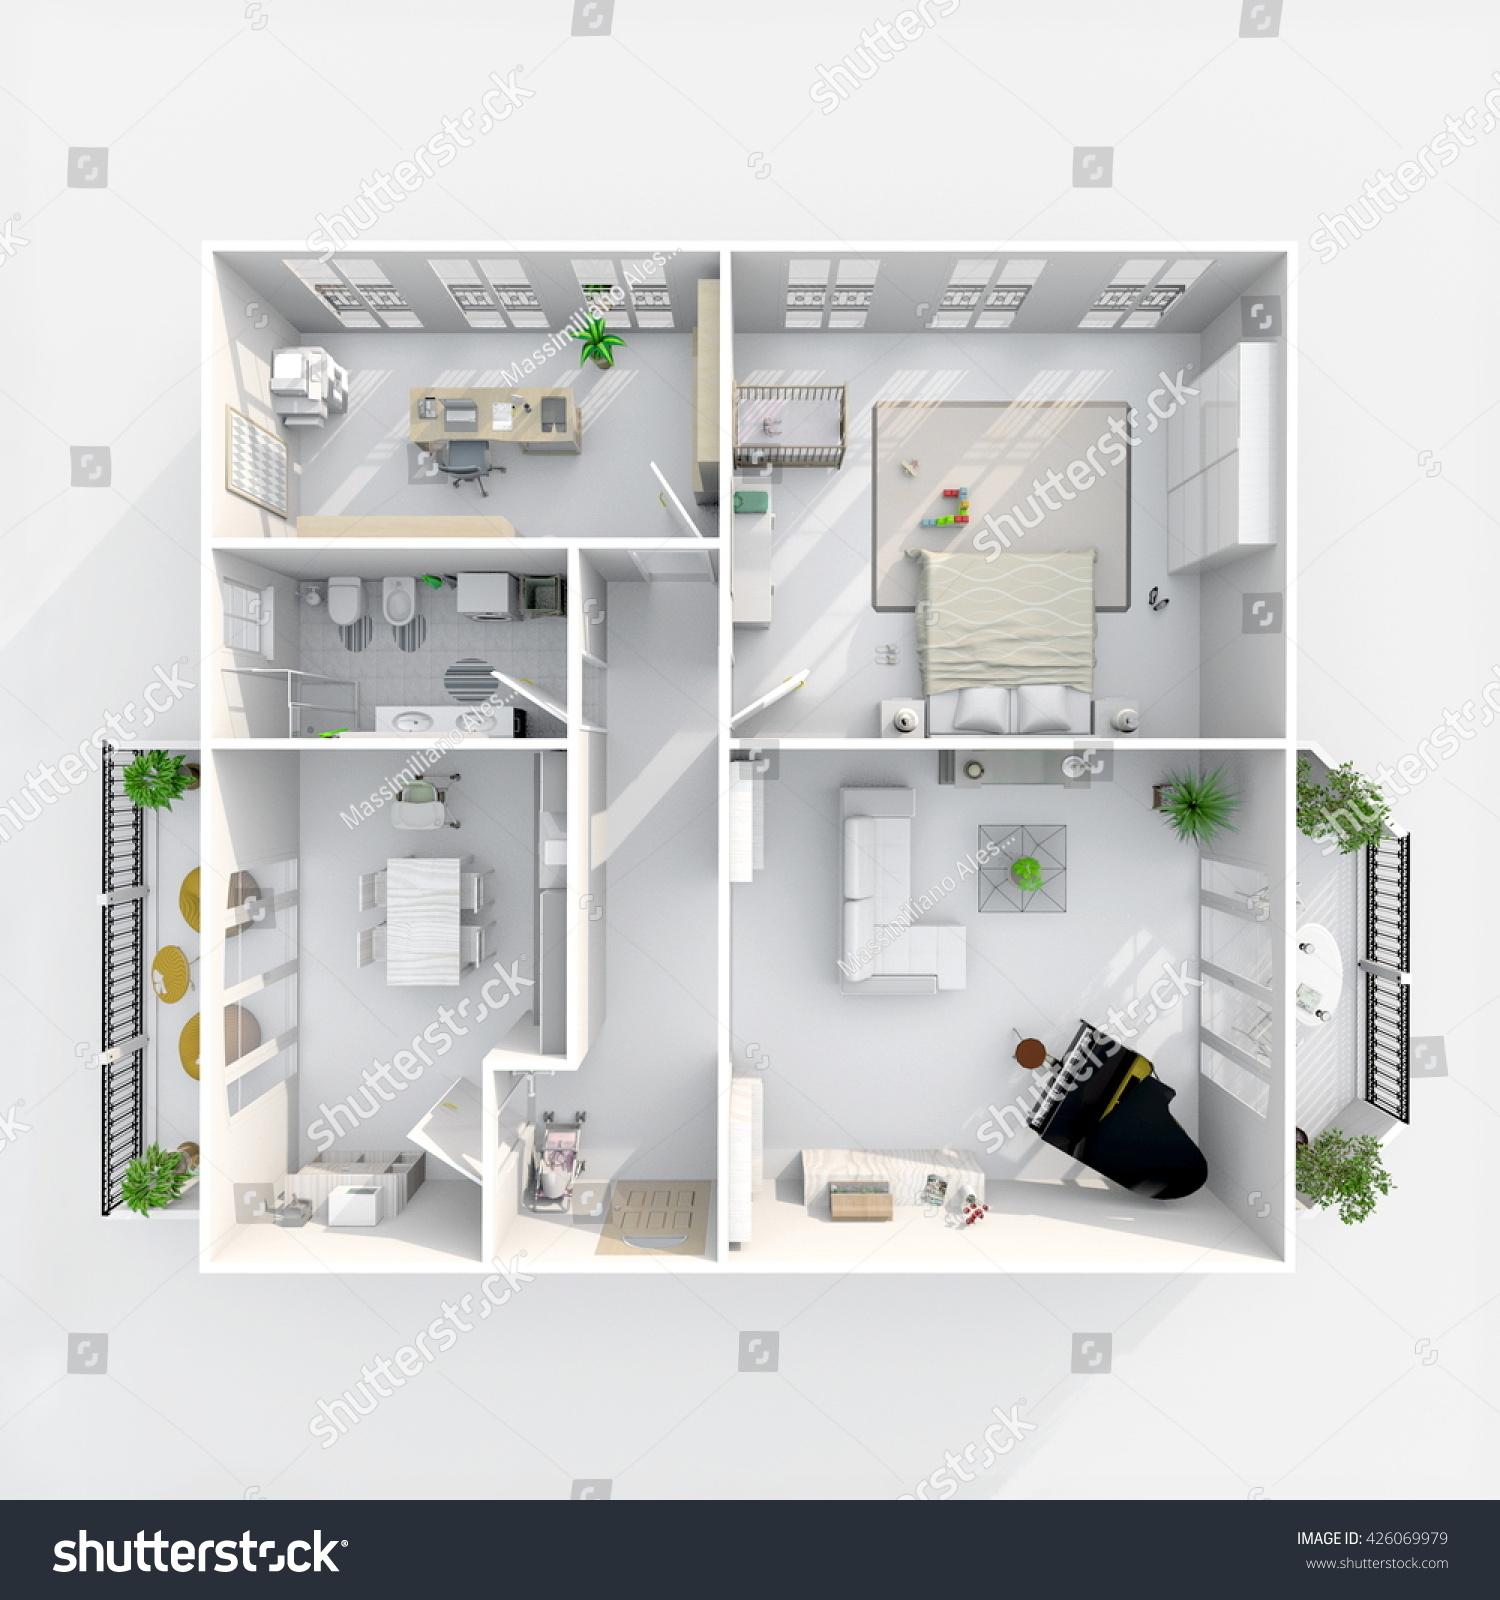 3d interior rendering plan view furnished stock for Living room bedroom bathroom kitchen